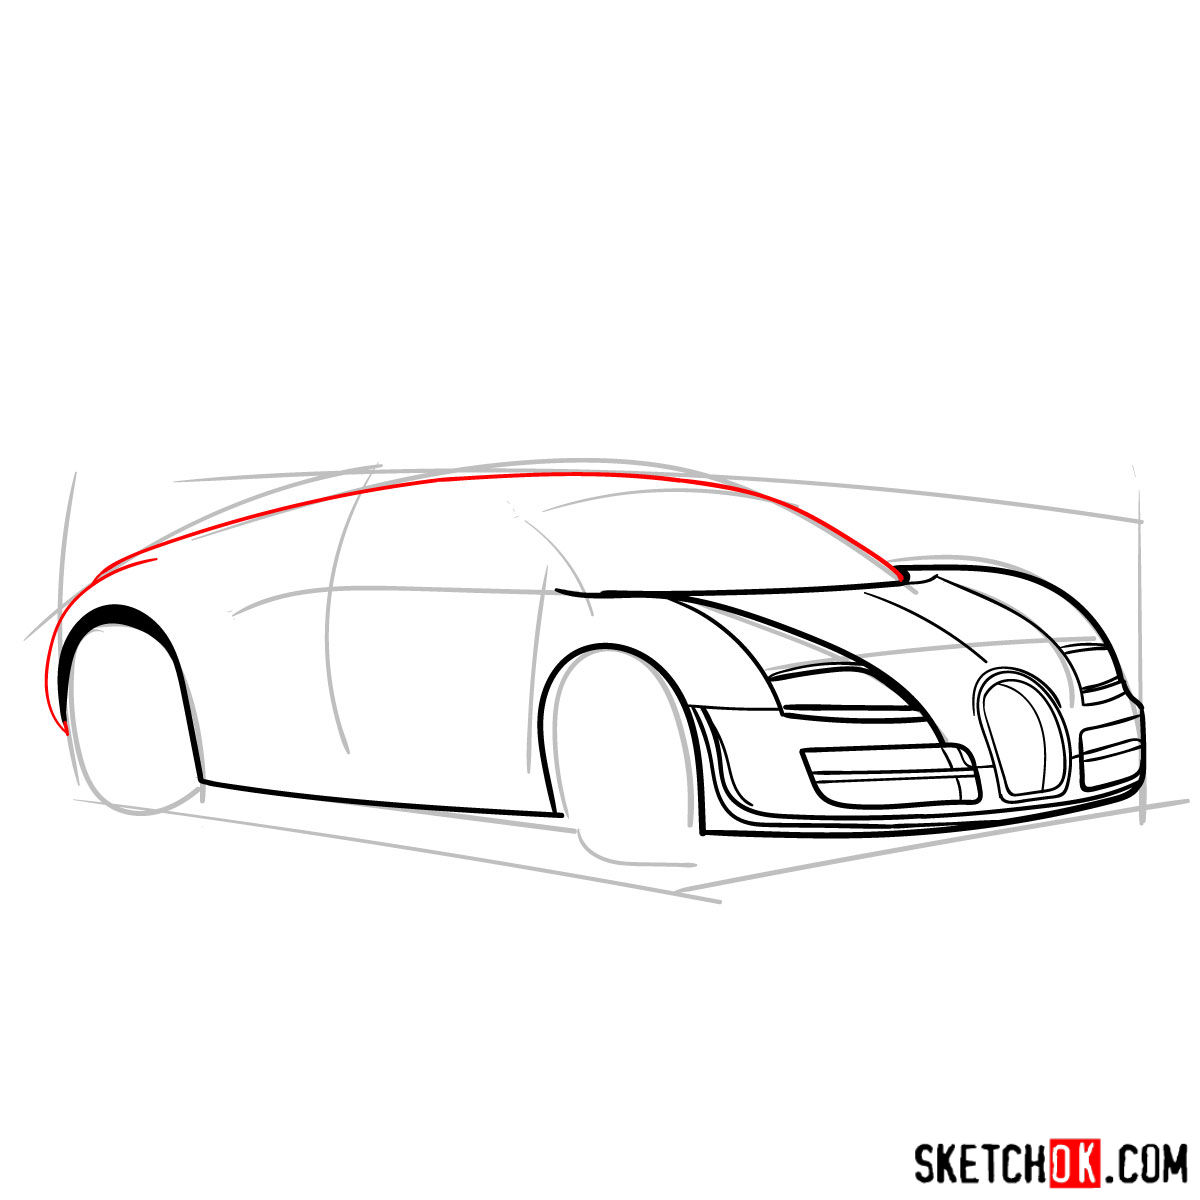 How to draw Bugatti Veyron 16.4 Super Sport -  step 06